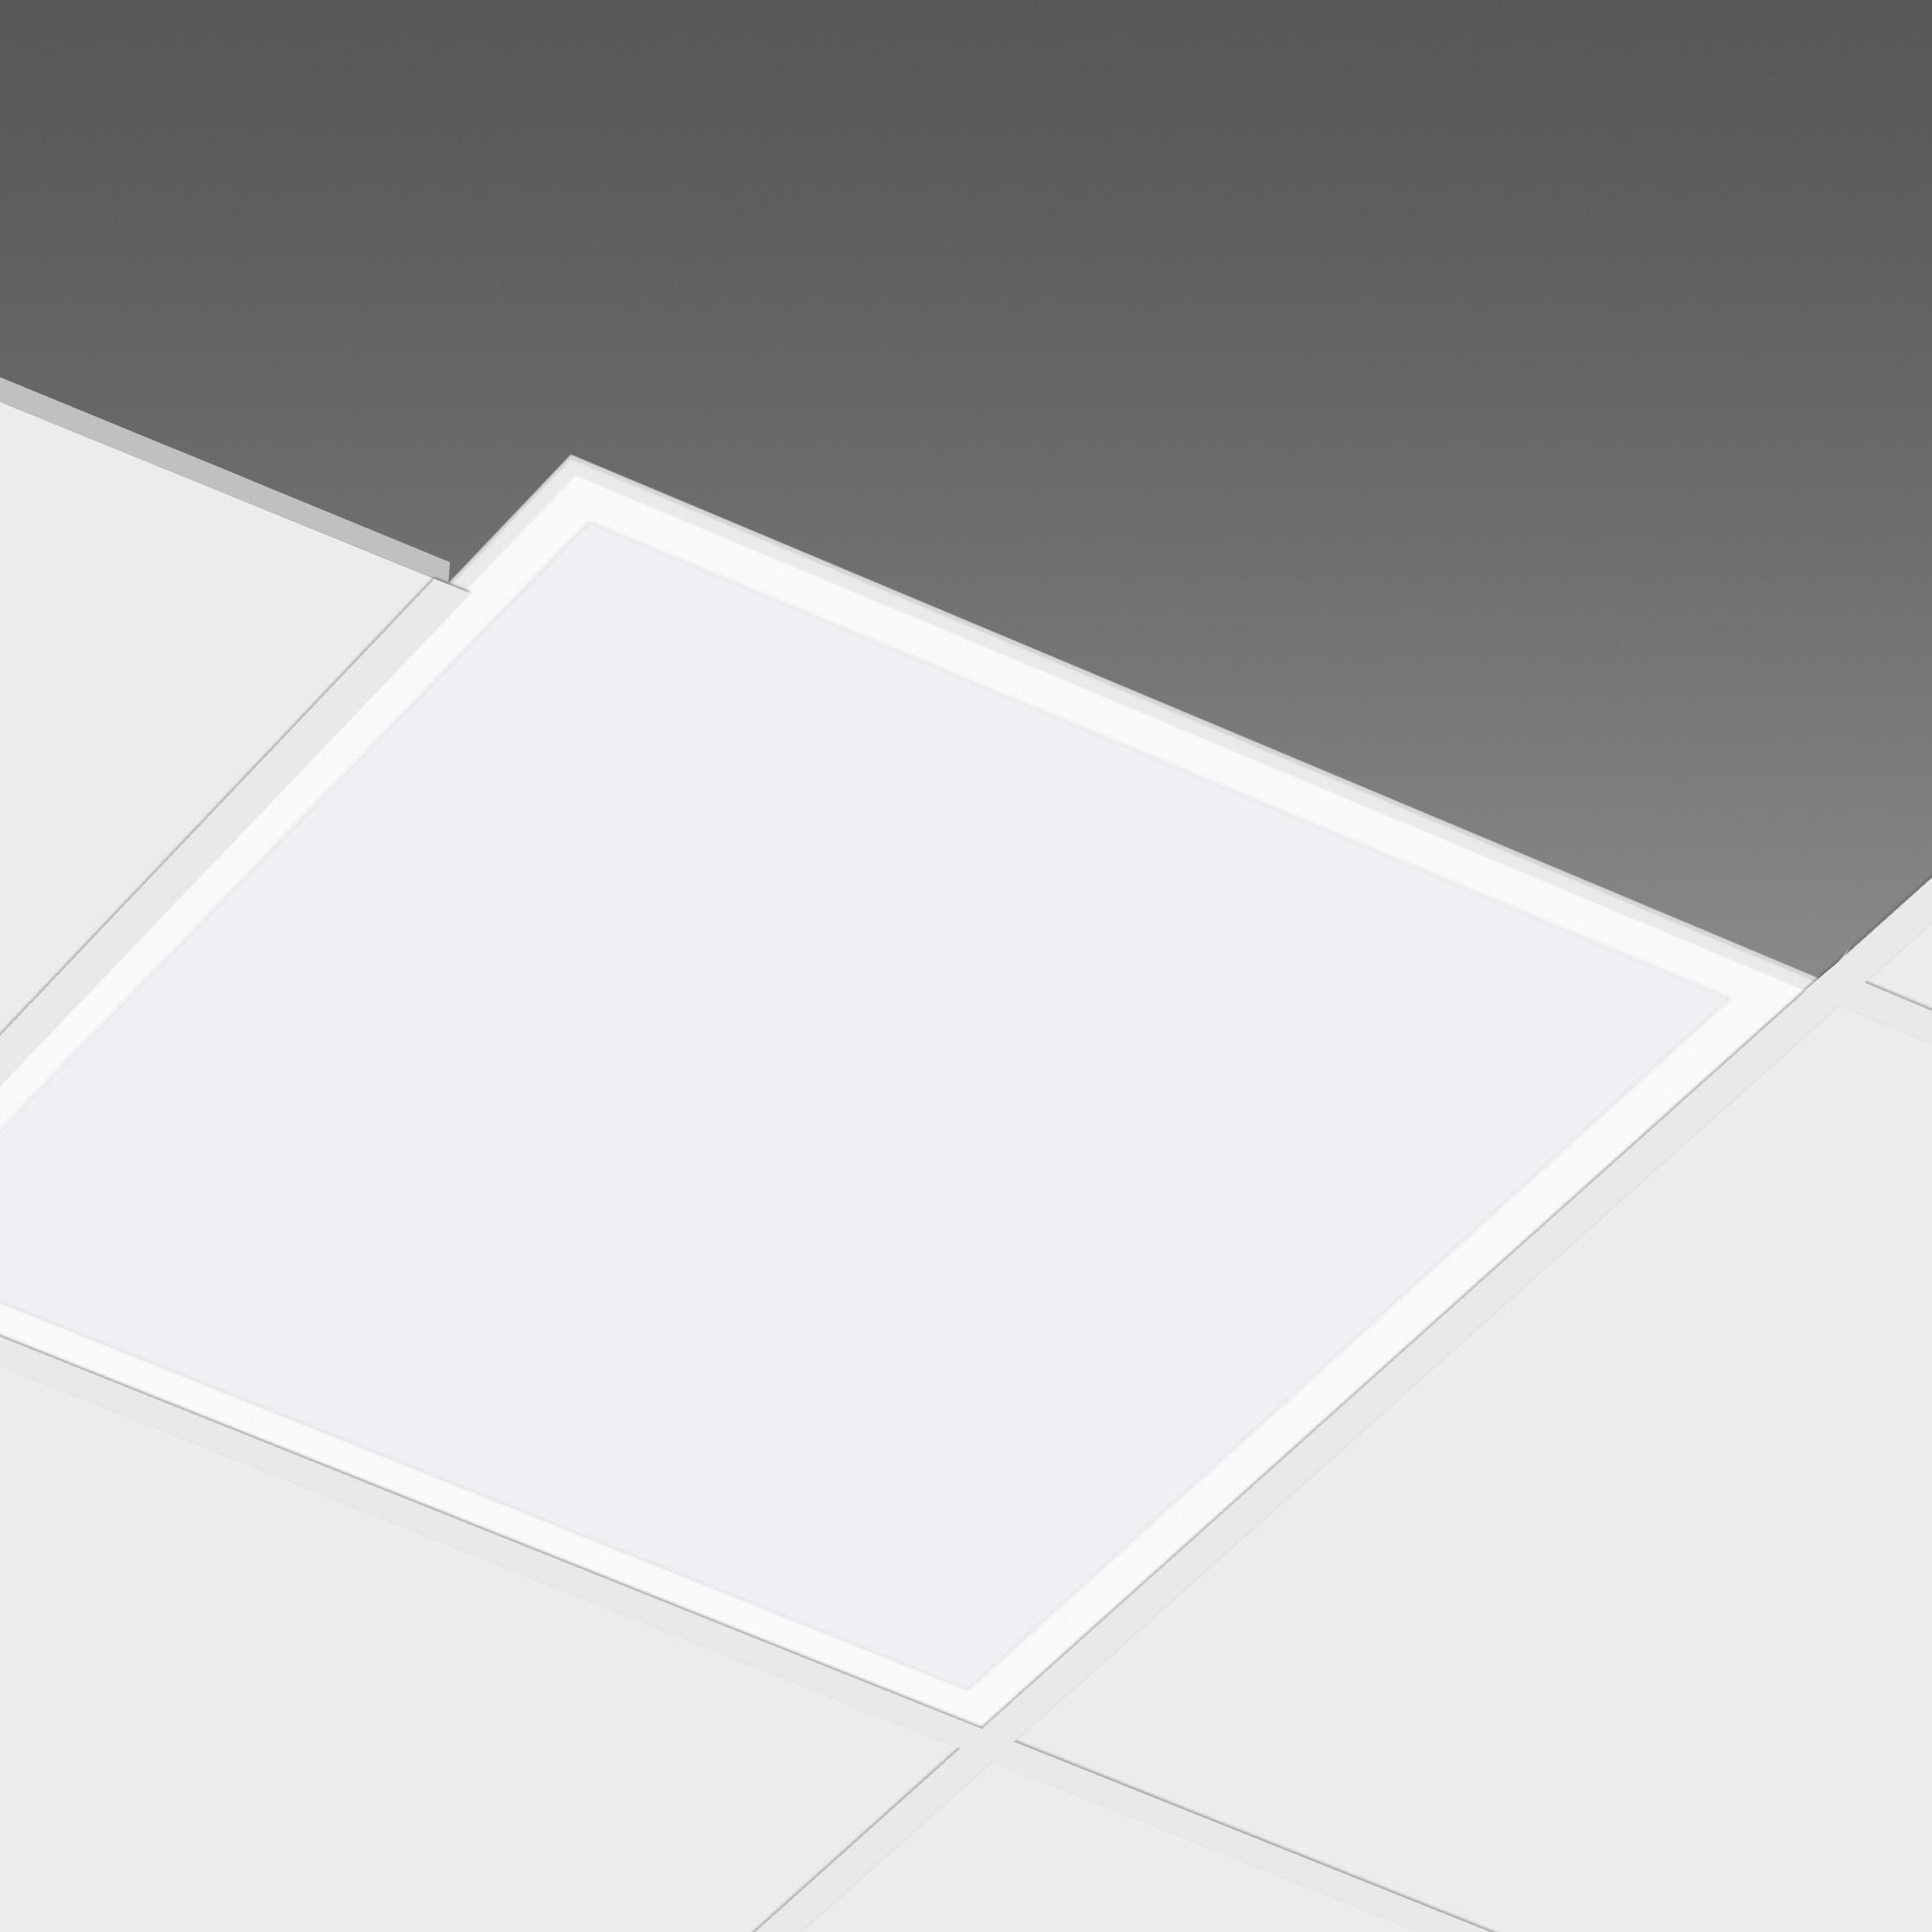 Afbeelding van 150200-39 31W/3000K DIS 840 PANEL CLD CTL LED